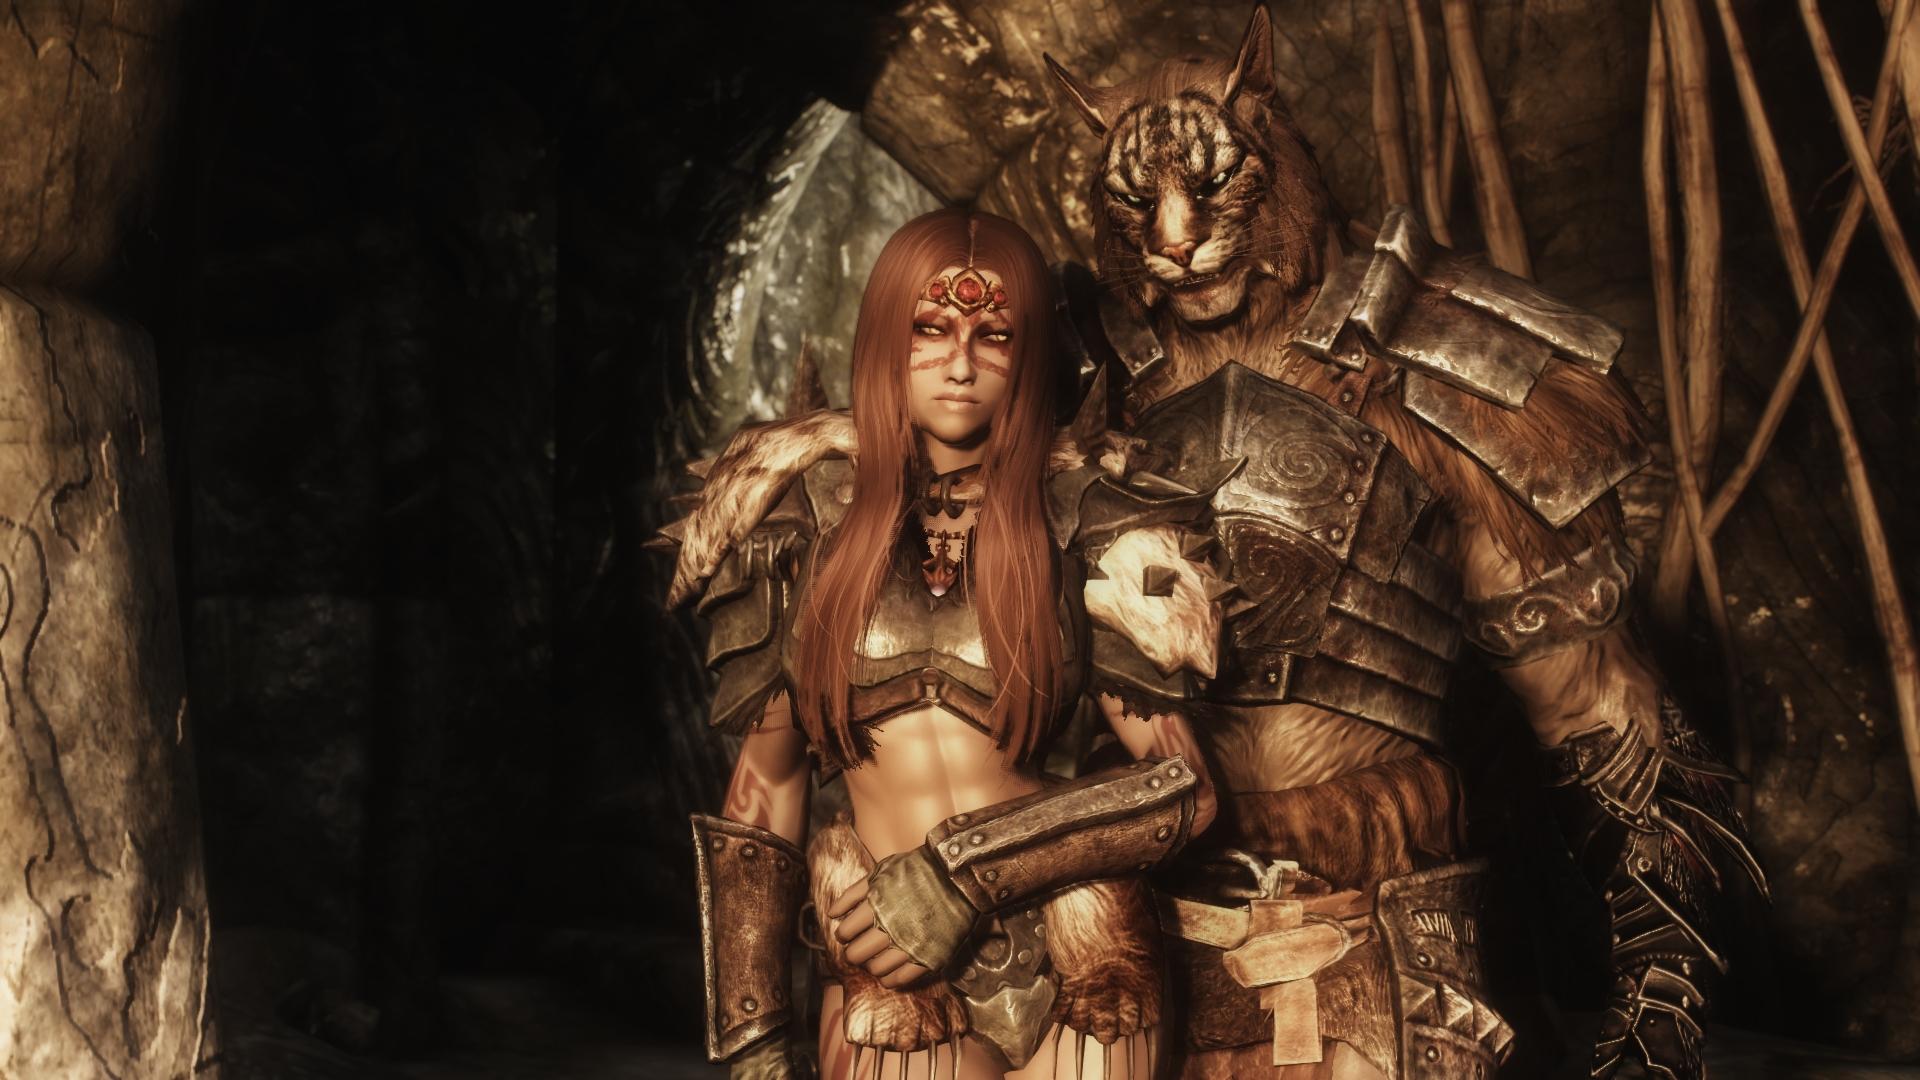 The Elder Scrolls V Skyrim Full Hd Wallpaper And Background Image  1920X1080  Id298646-9161